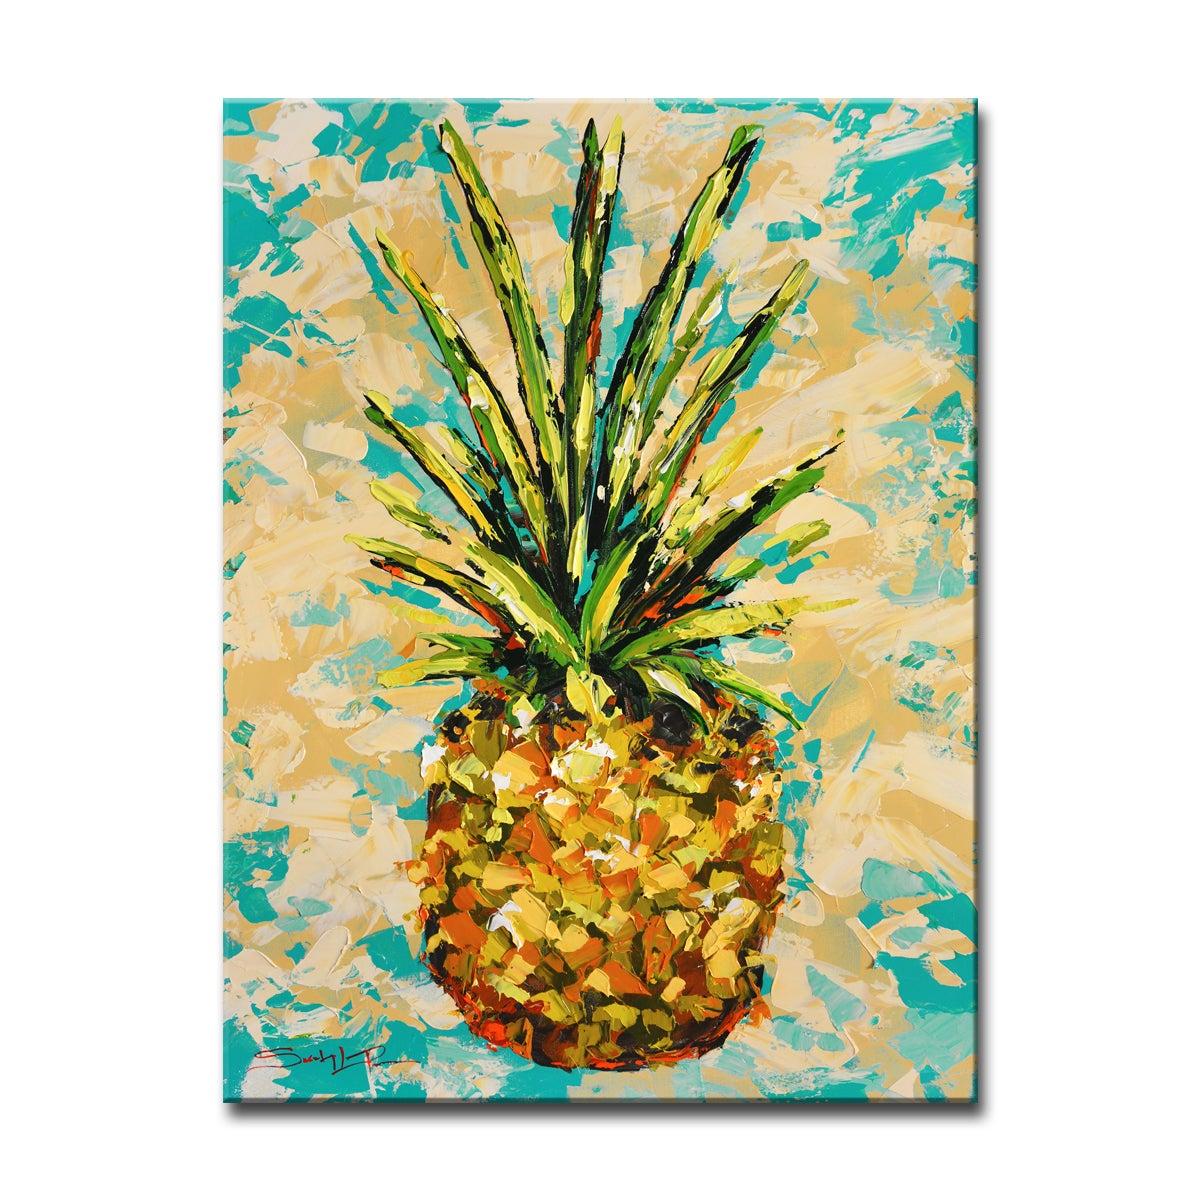 Vertical Art Gallery For Less | Overstock.com